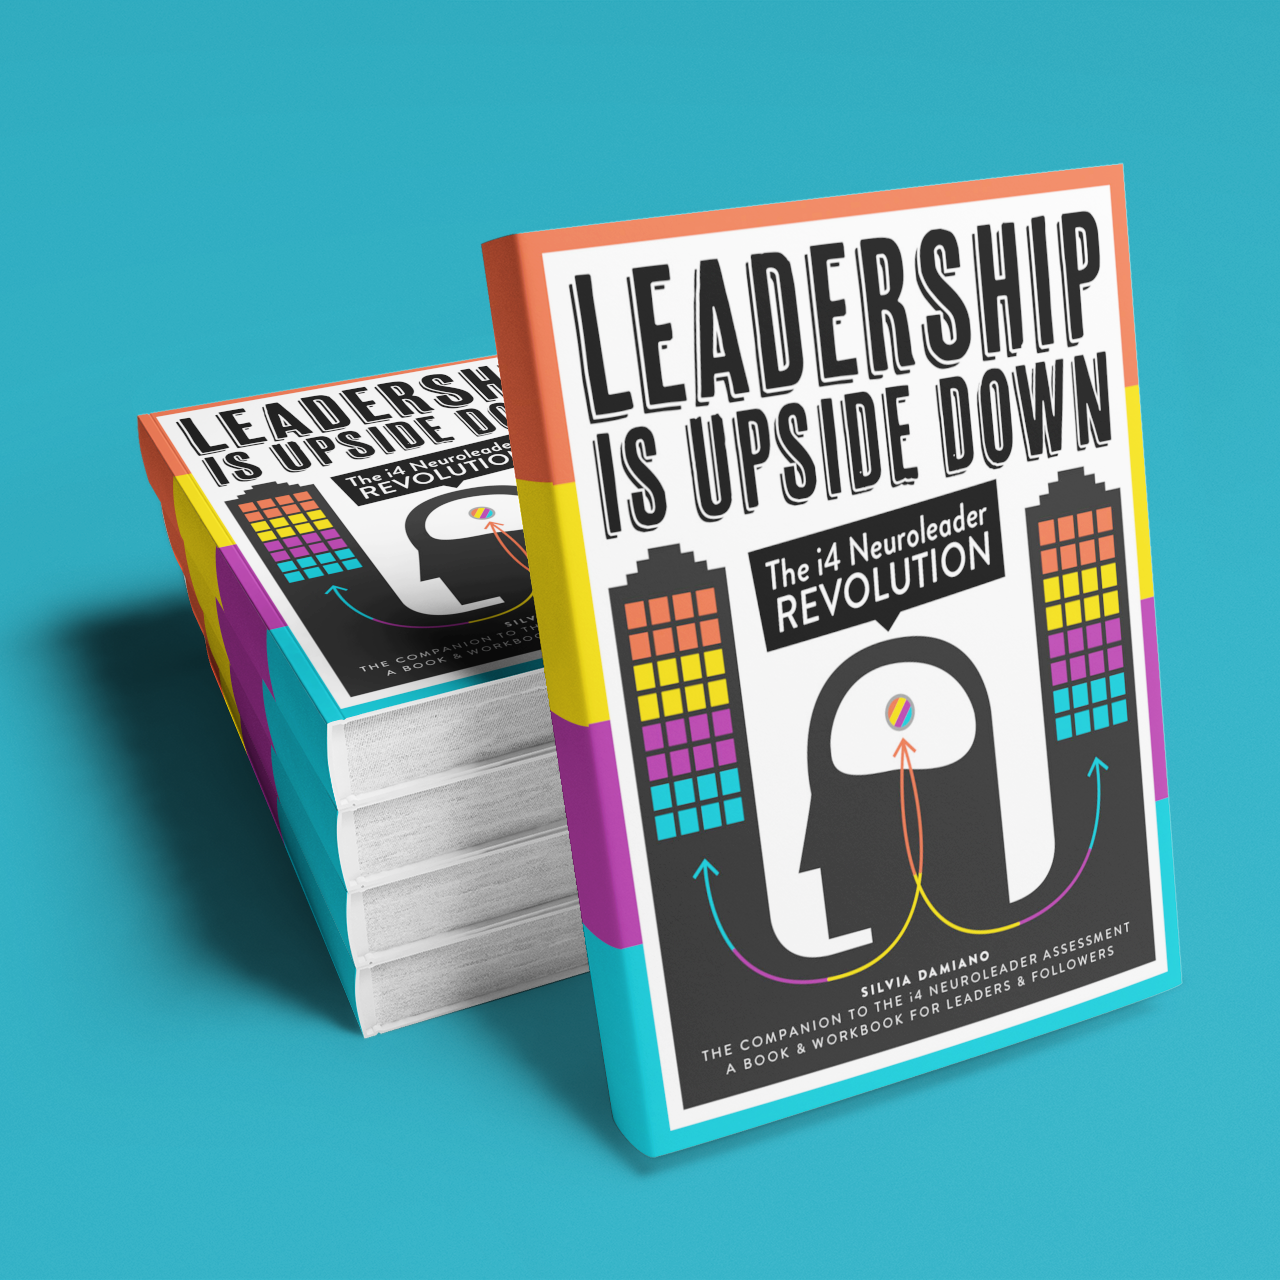 leadership-is-upside-down-the-i4-neuroleader-revolution-1